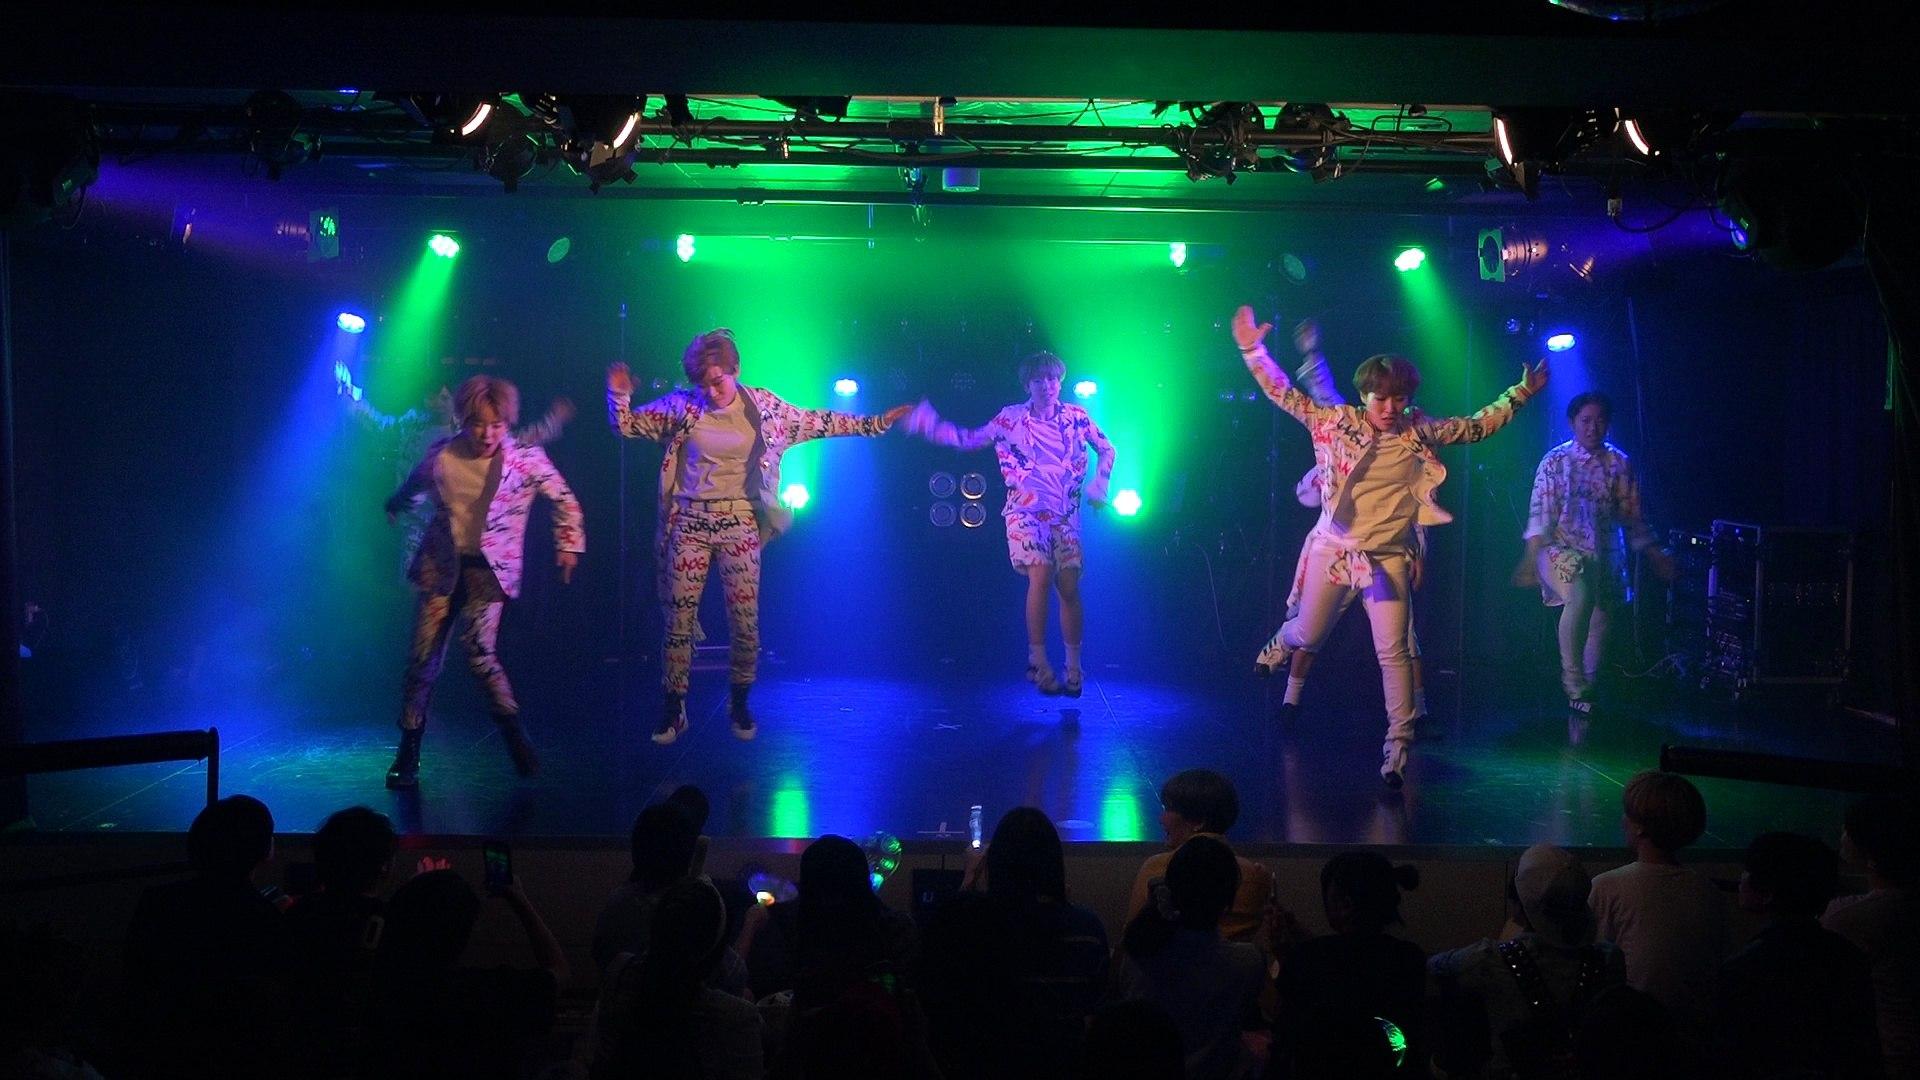 ASSSA 「GOT7 - LAUGH LAUGH LAUGH & LOVE TRAIN」 TURN UP! 2016.07.10